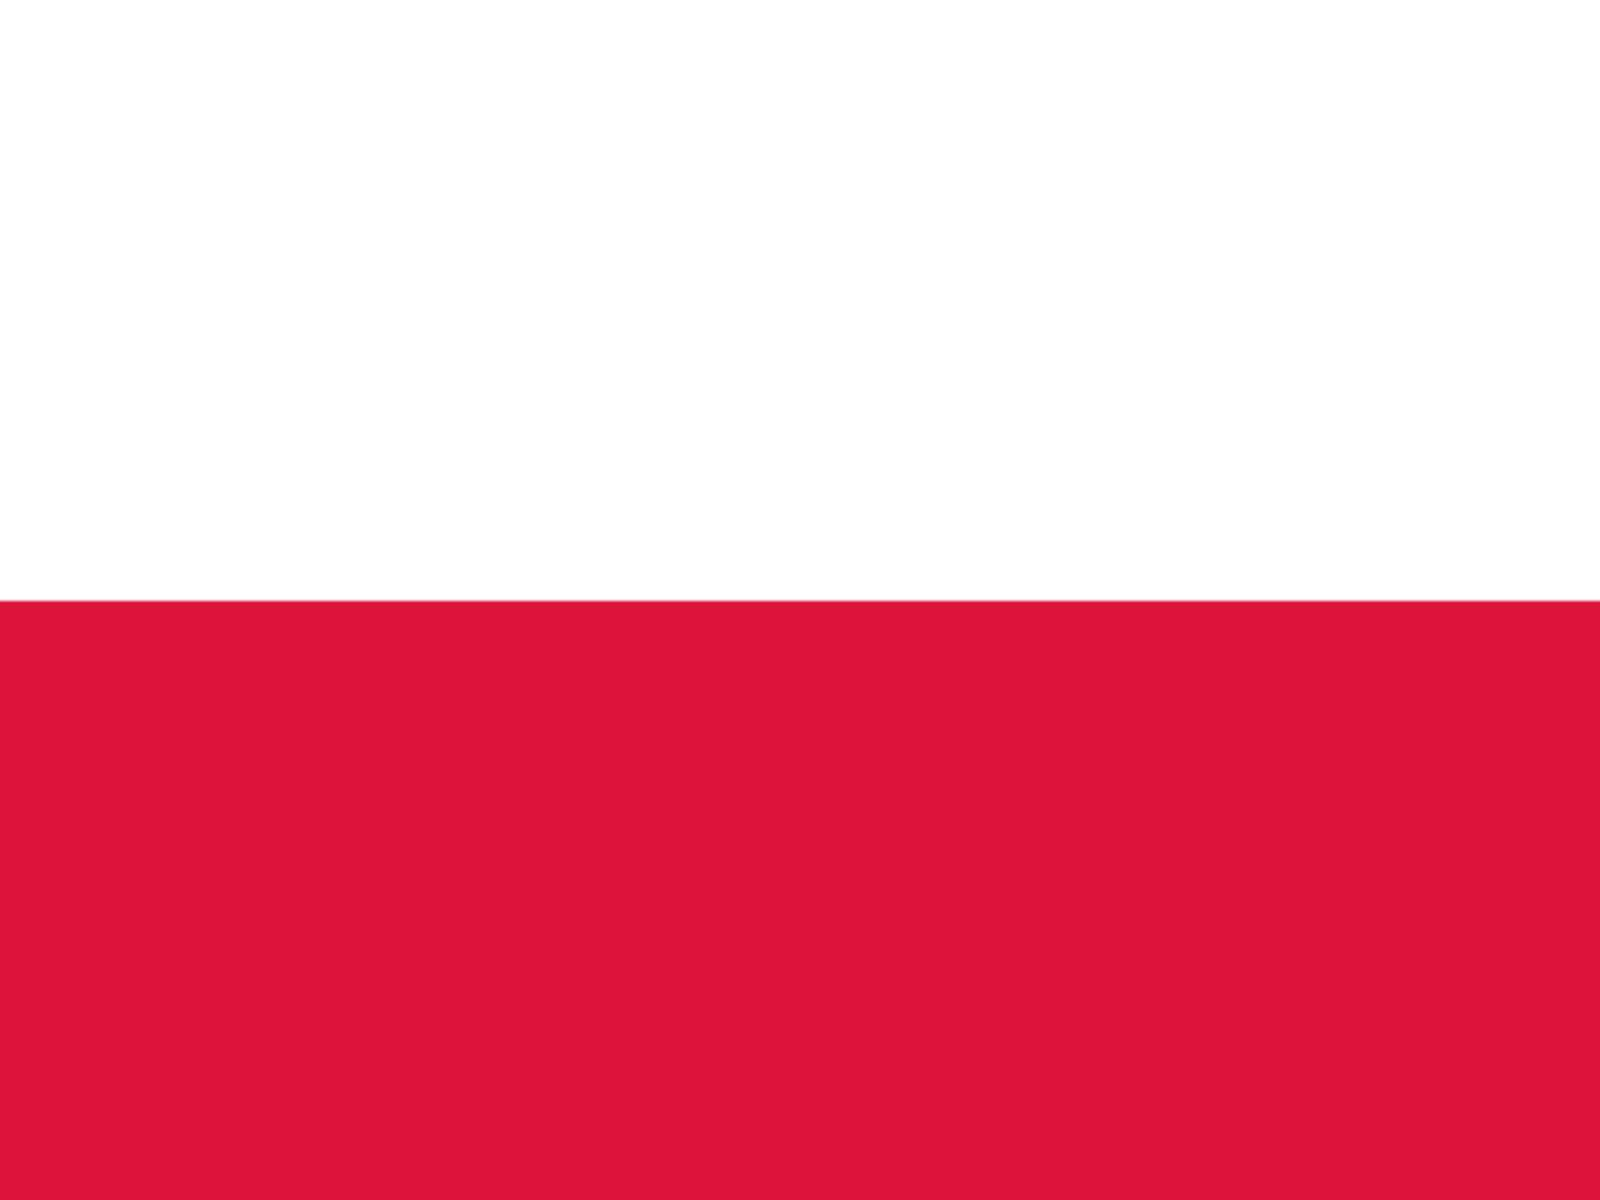 Flagge Polens